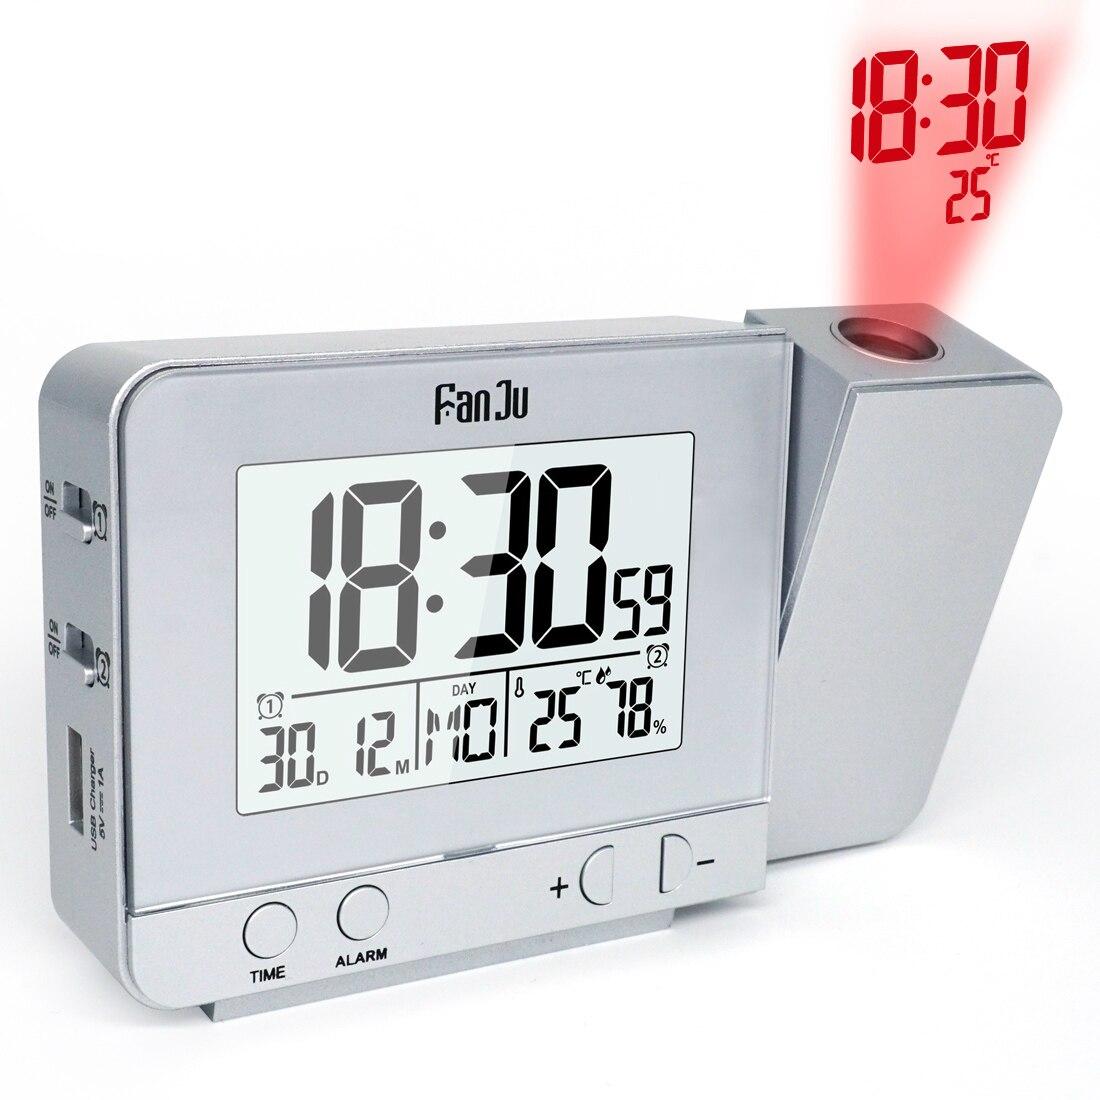 FanJu Digital Snooze Alarm Clock Projection Function Backlight Projector Desk Table FJ3531